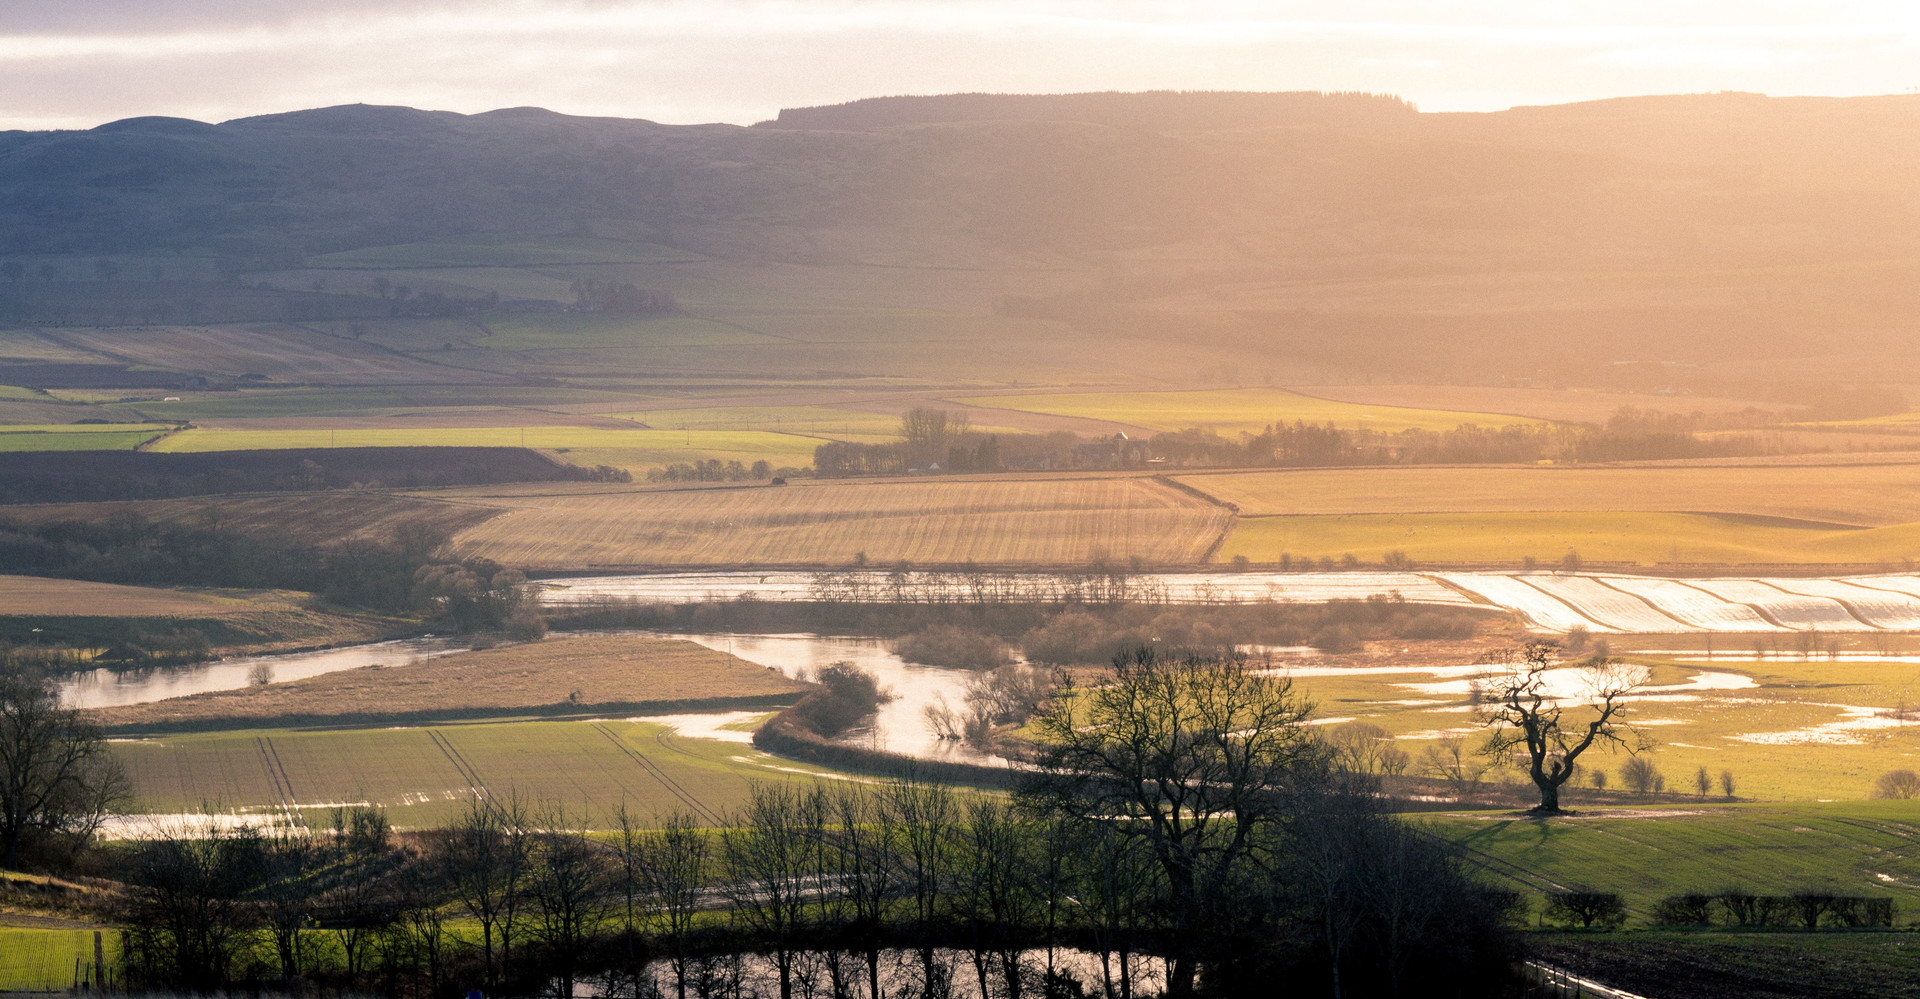 Lowland Perthshire